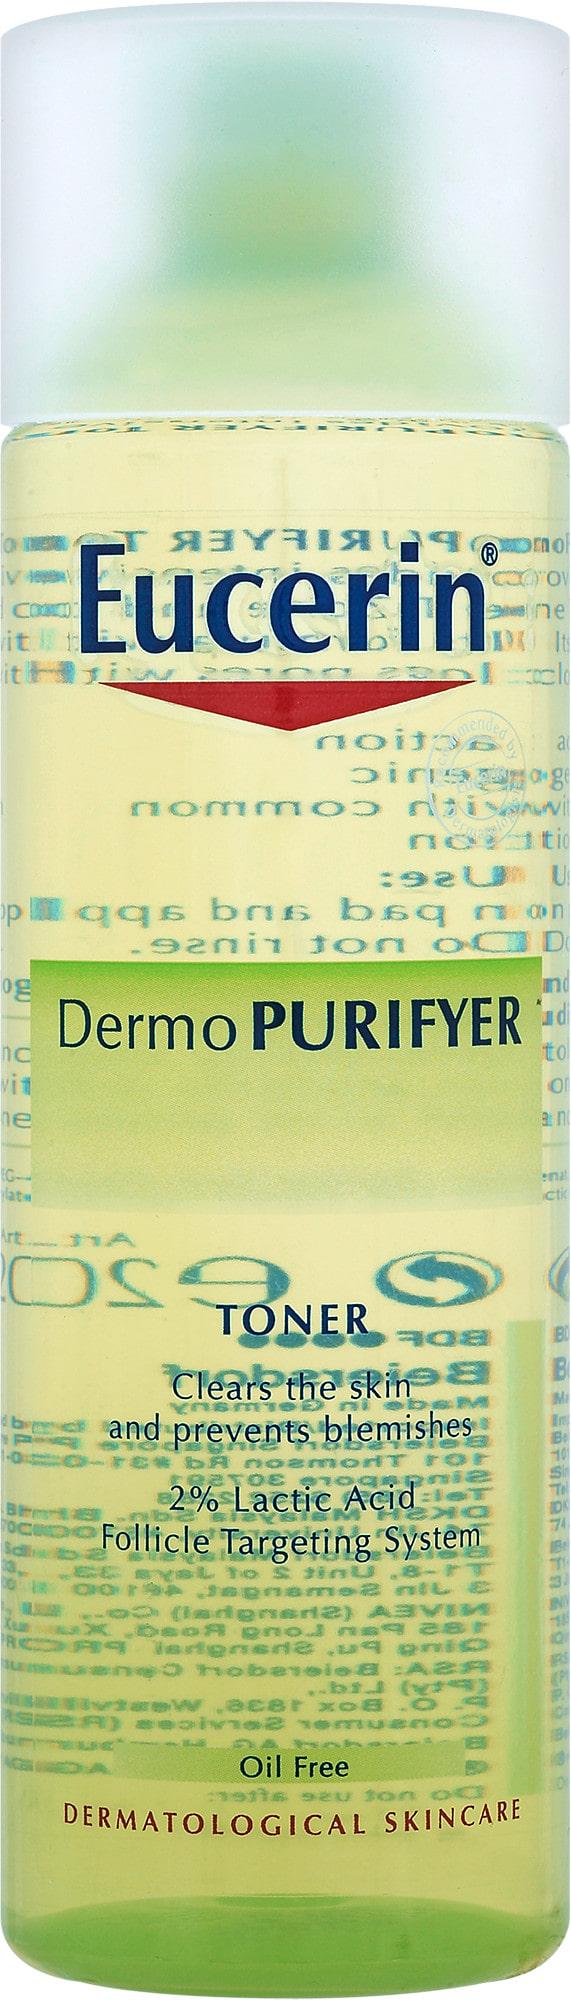 Eucerin DermoPURIFYER Toner